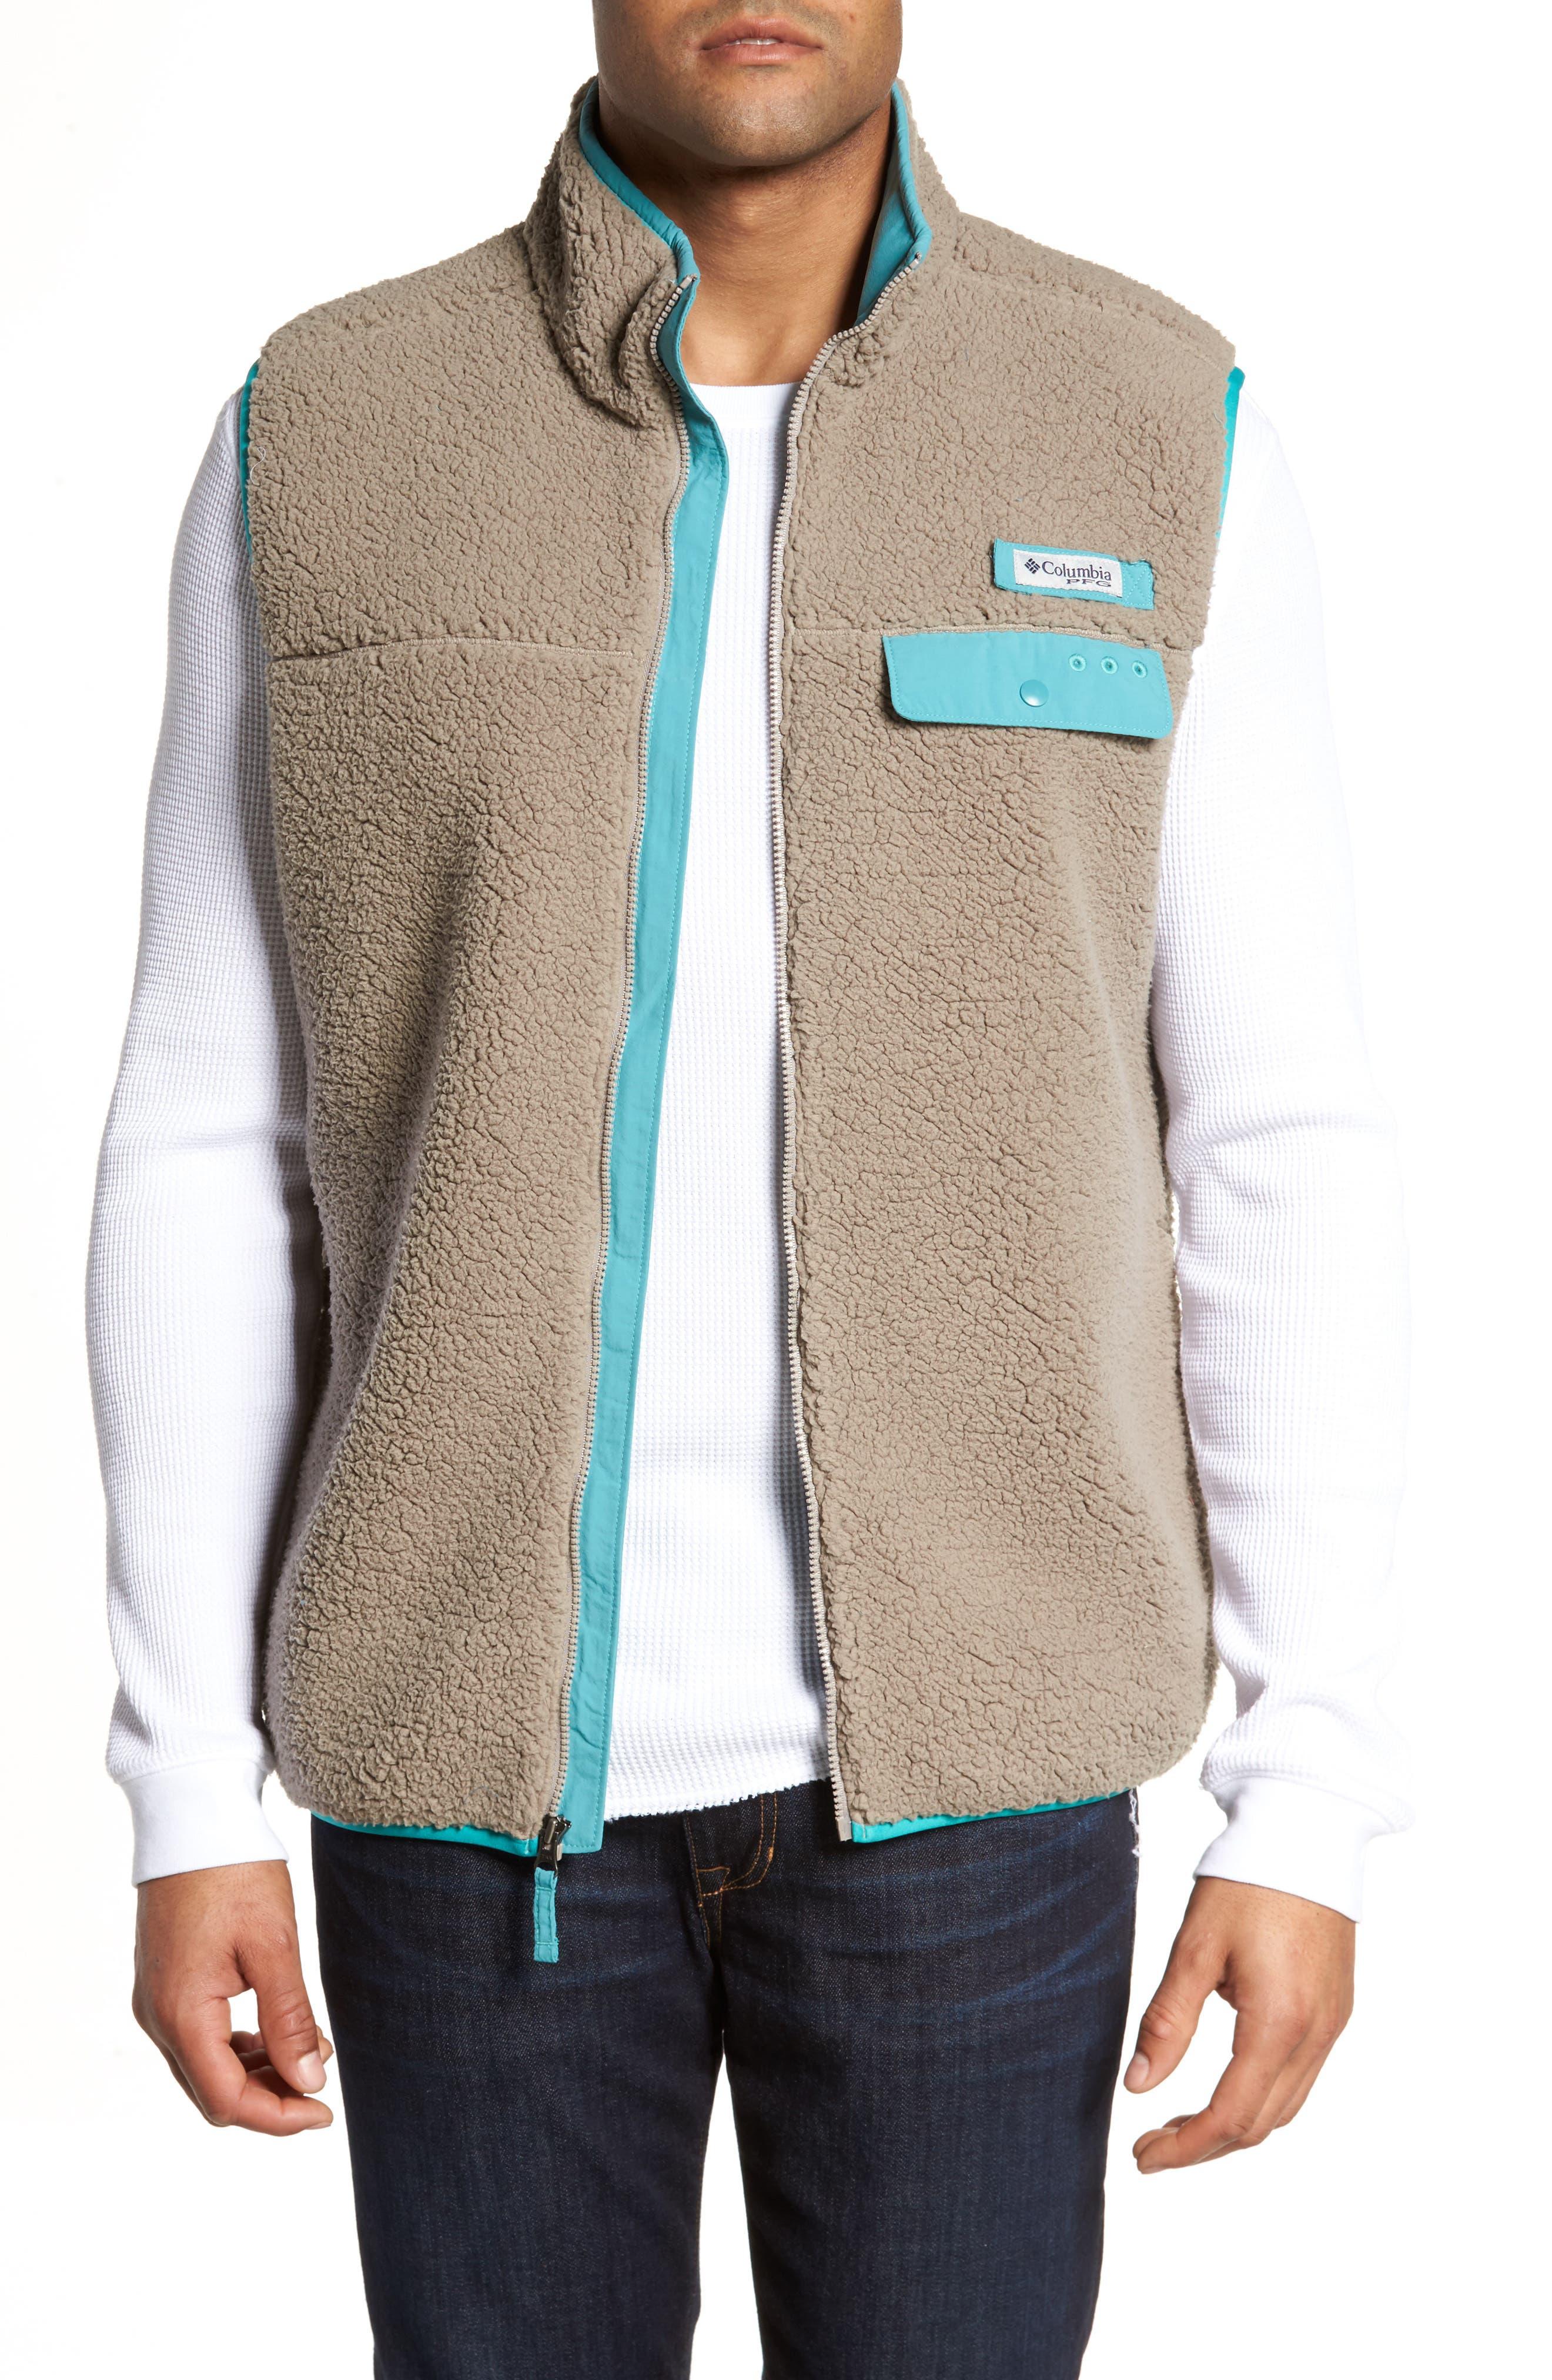 Main Image - Columbia Sportswear Harborside Heavyweight Fleece Vest